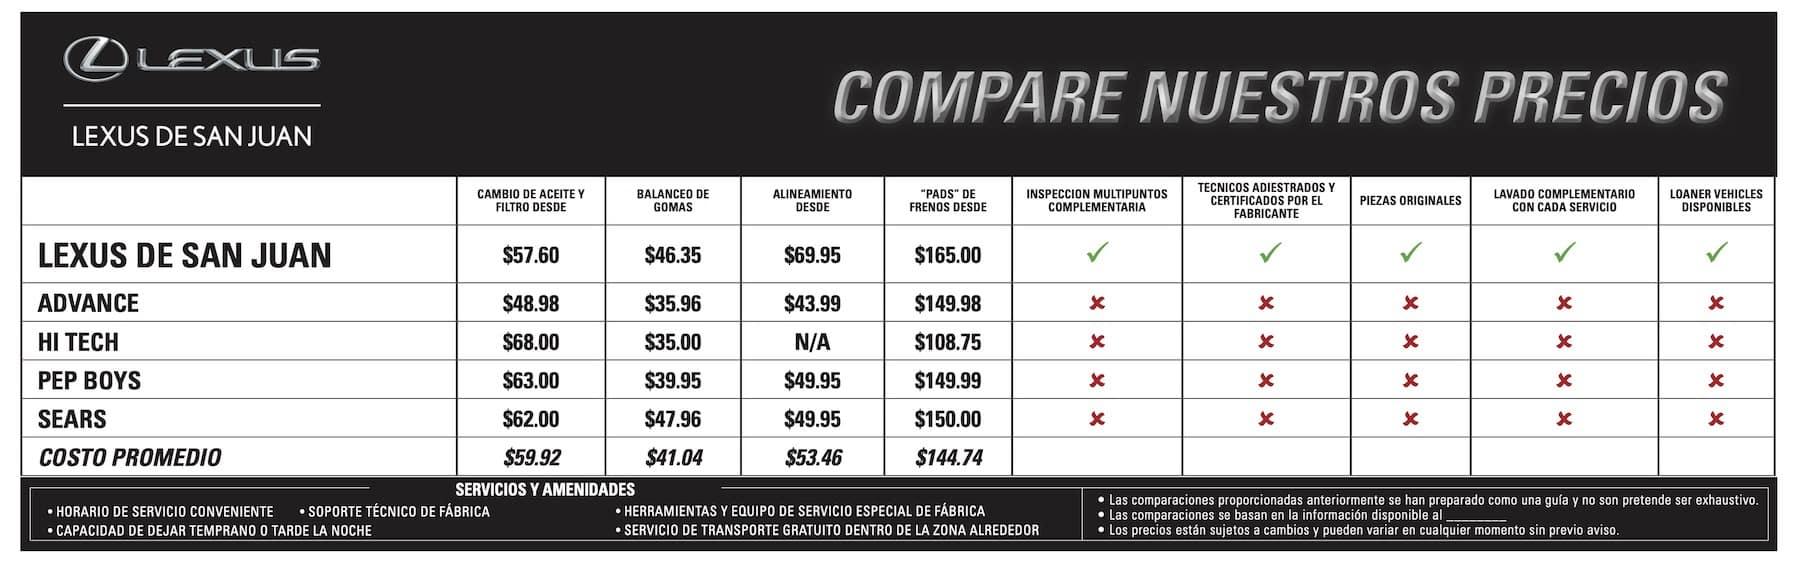 Compare neustros precios